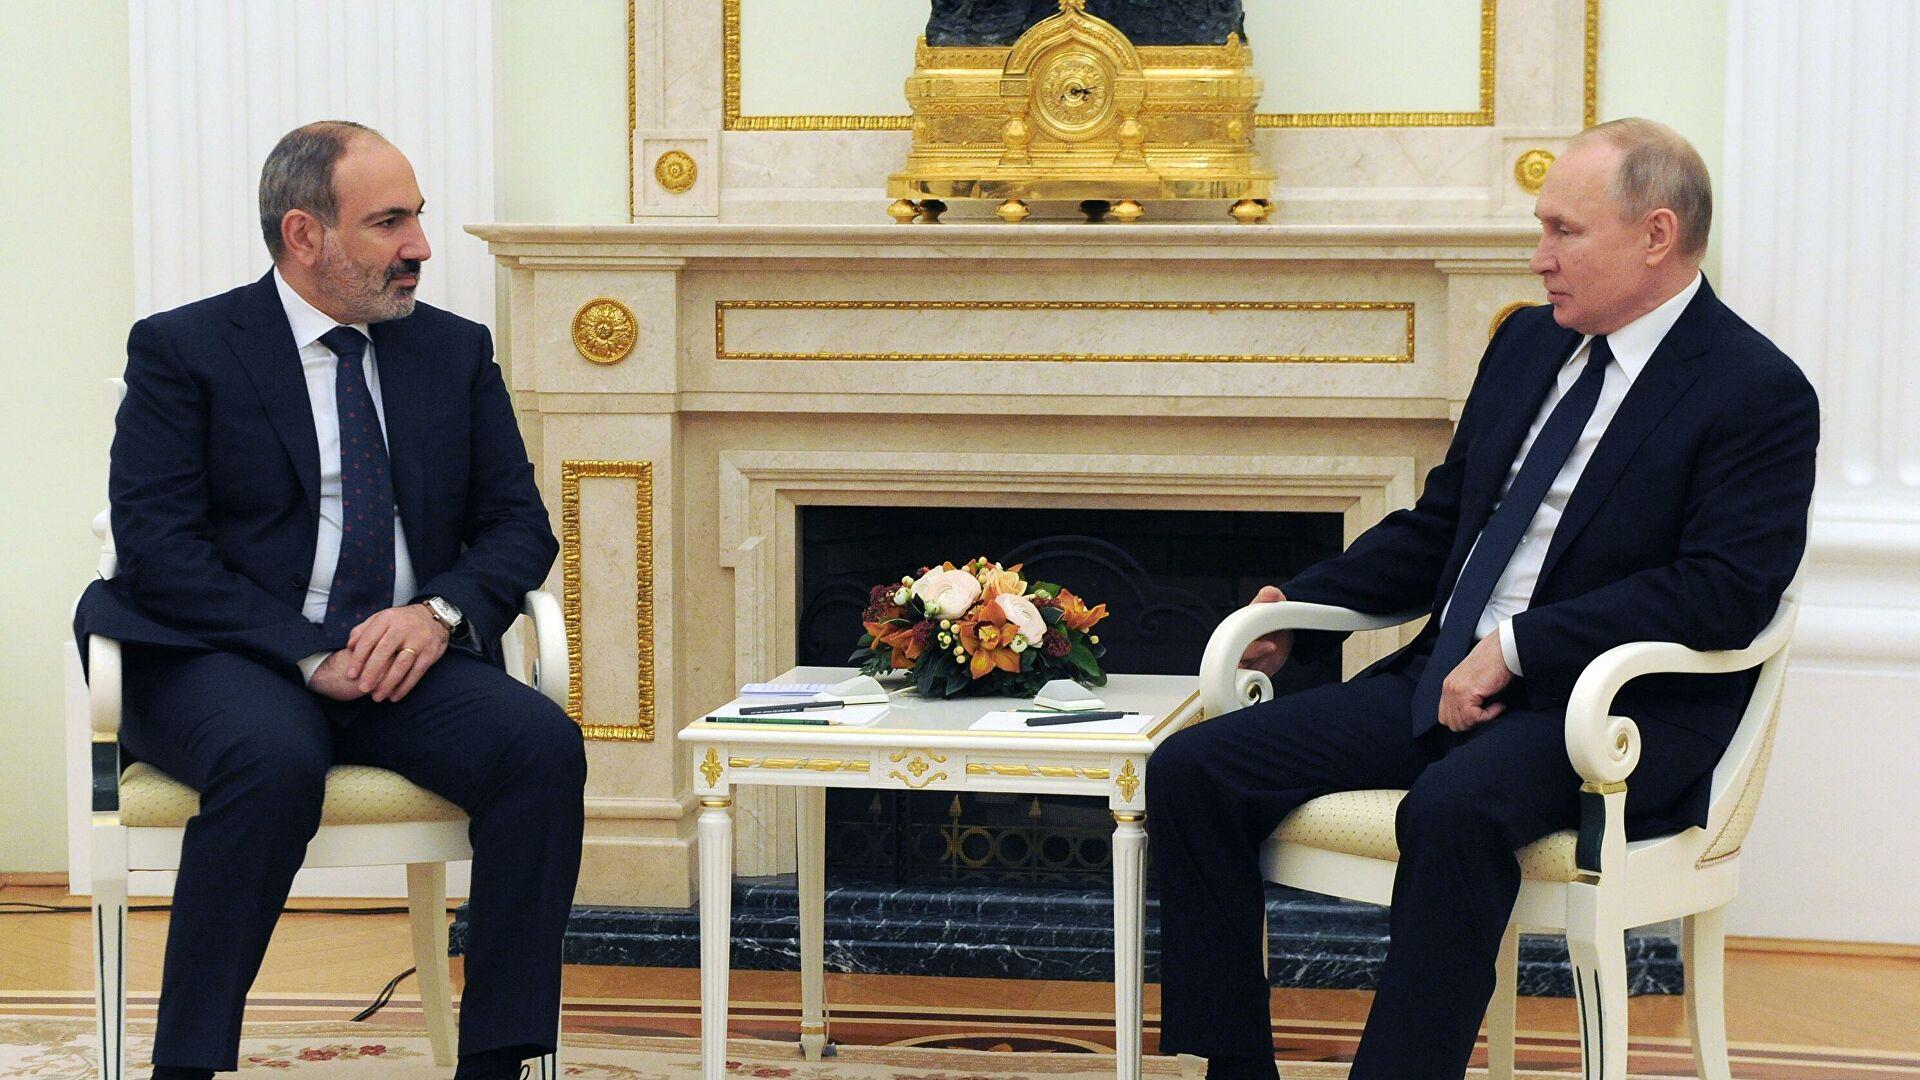 1 j prezident armenii obyasnil sut otveta putina na pismo pashinyana s prosboj o pomoshhi 1 j prezident armenii obyasnil sut otveta putina na pismo pashinyana s prosboj o pomoshhi